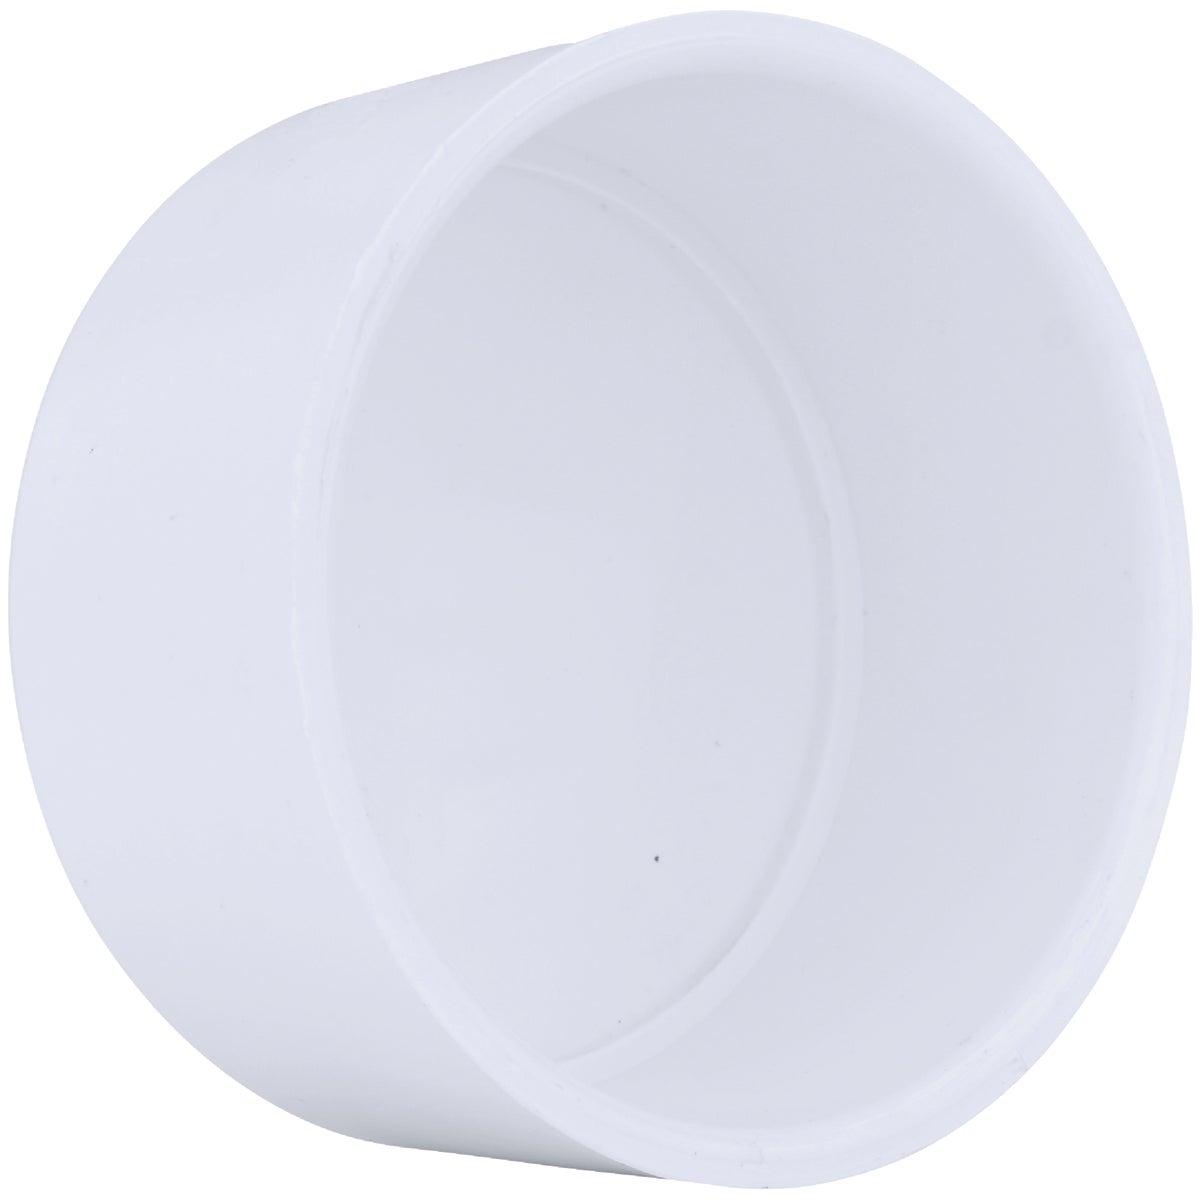 "4"" PVC SCH40 SLIP CAP - 30154 by Genova Inc"